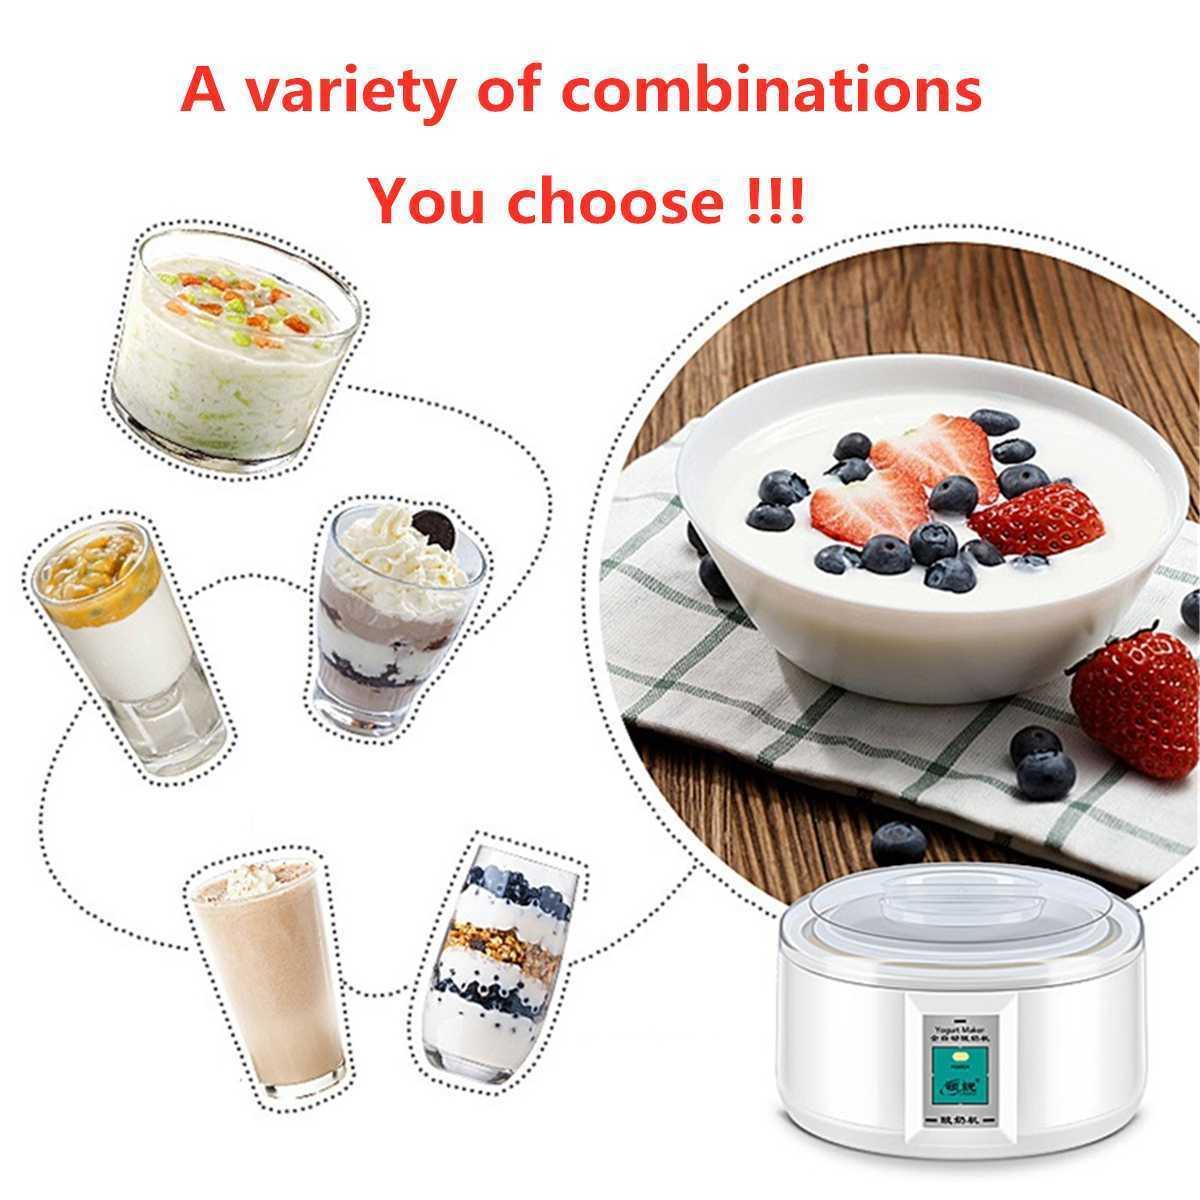 1.5l Electric Yogurt Maker Yogurt Diy Tool Kitchen Appliances Automatic Yogurt Maker With 7 Jars Liner Material Stainless Steel T190619